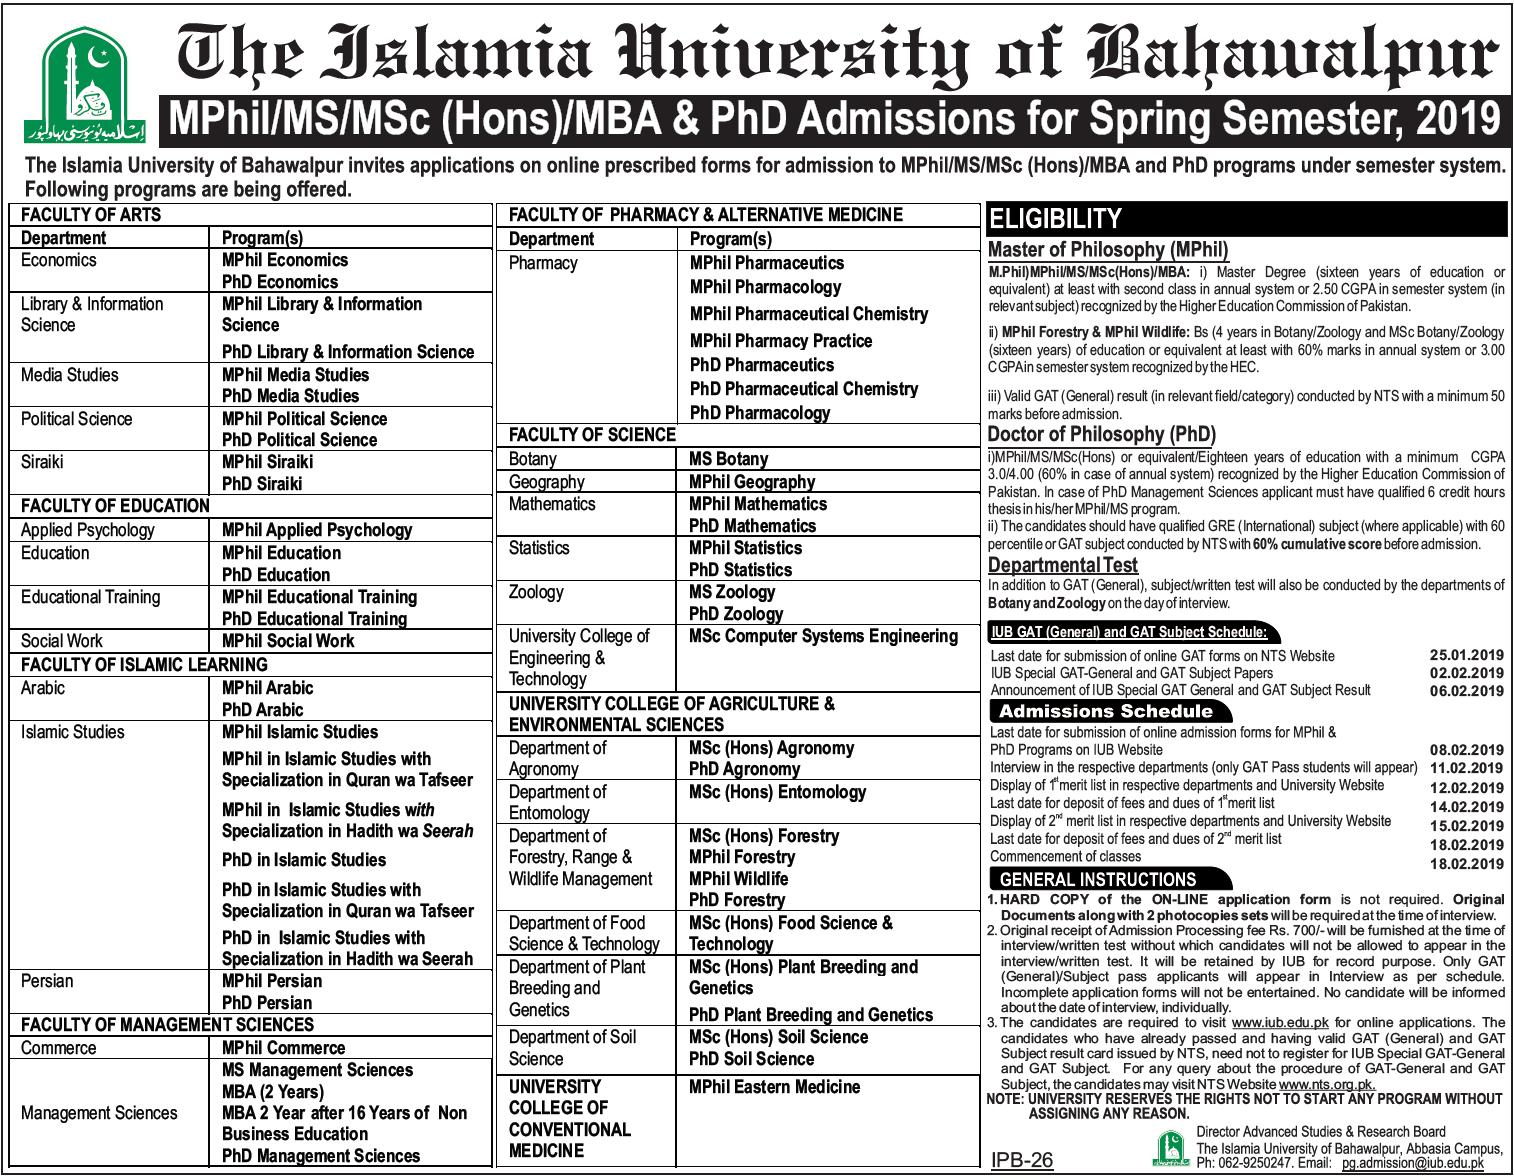 Islamia University of Bahawalpur IUB MPhil, MS, PhD Admissions 2019 Form